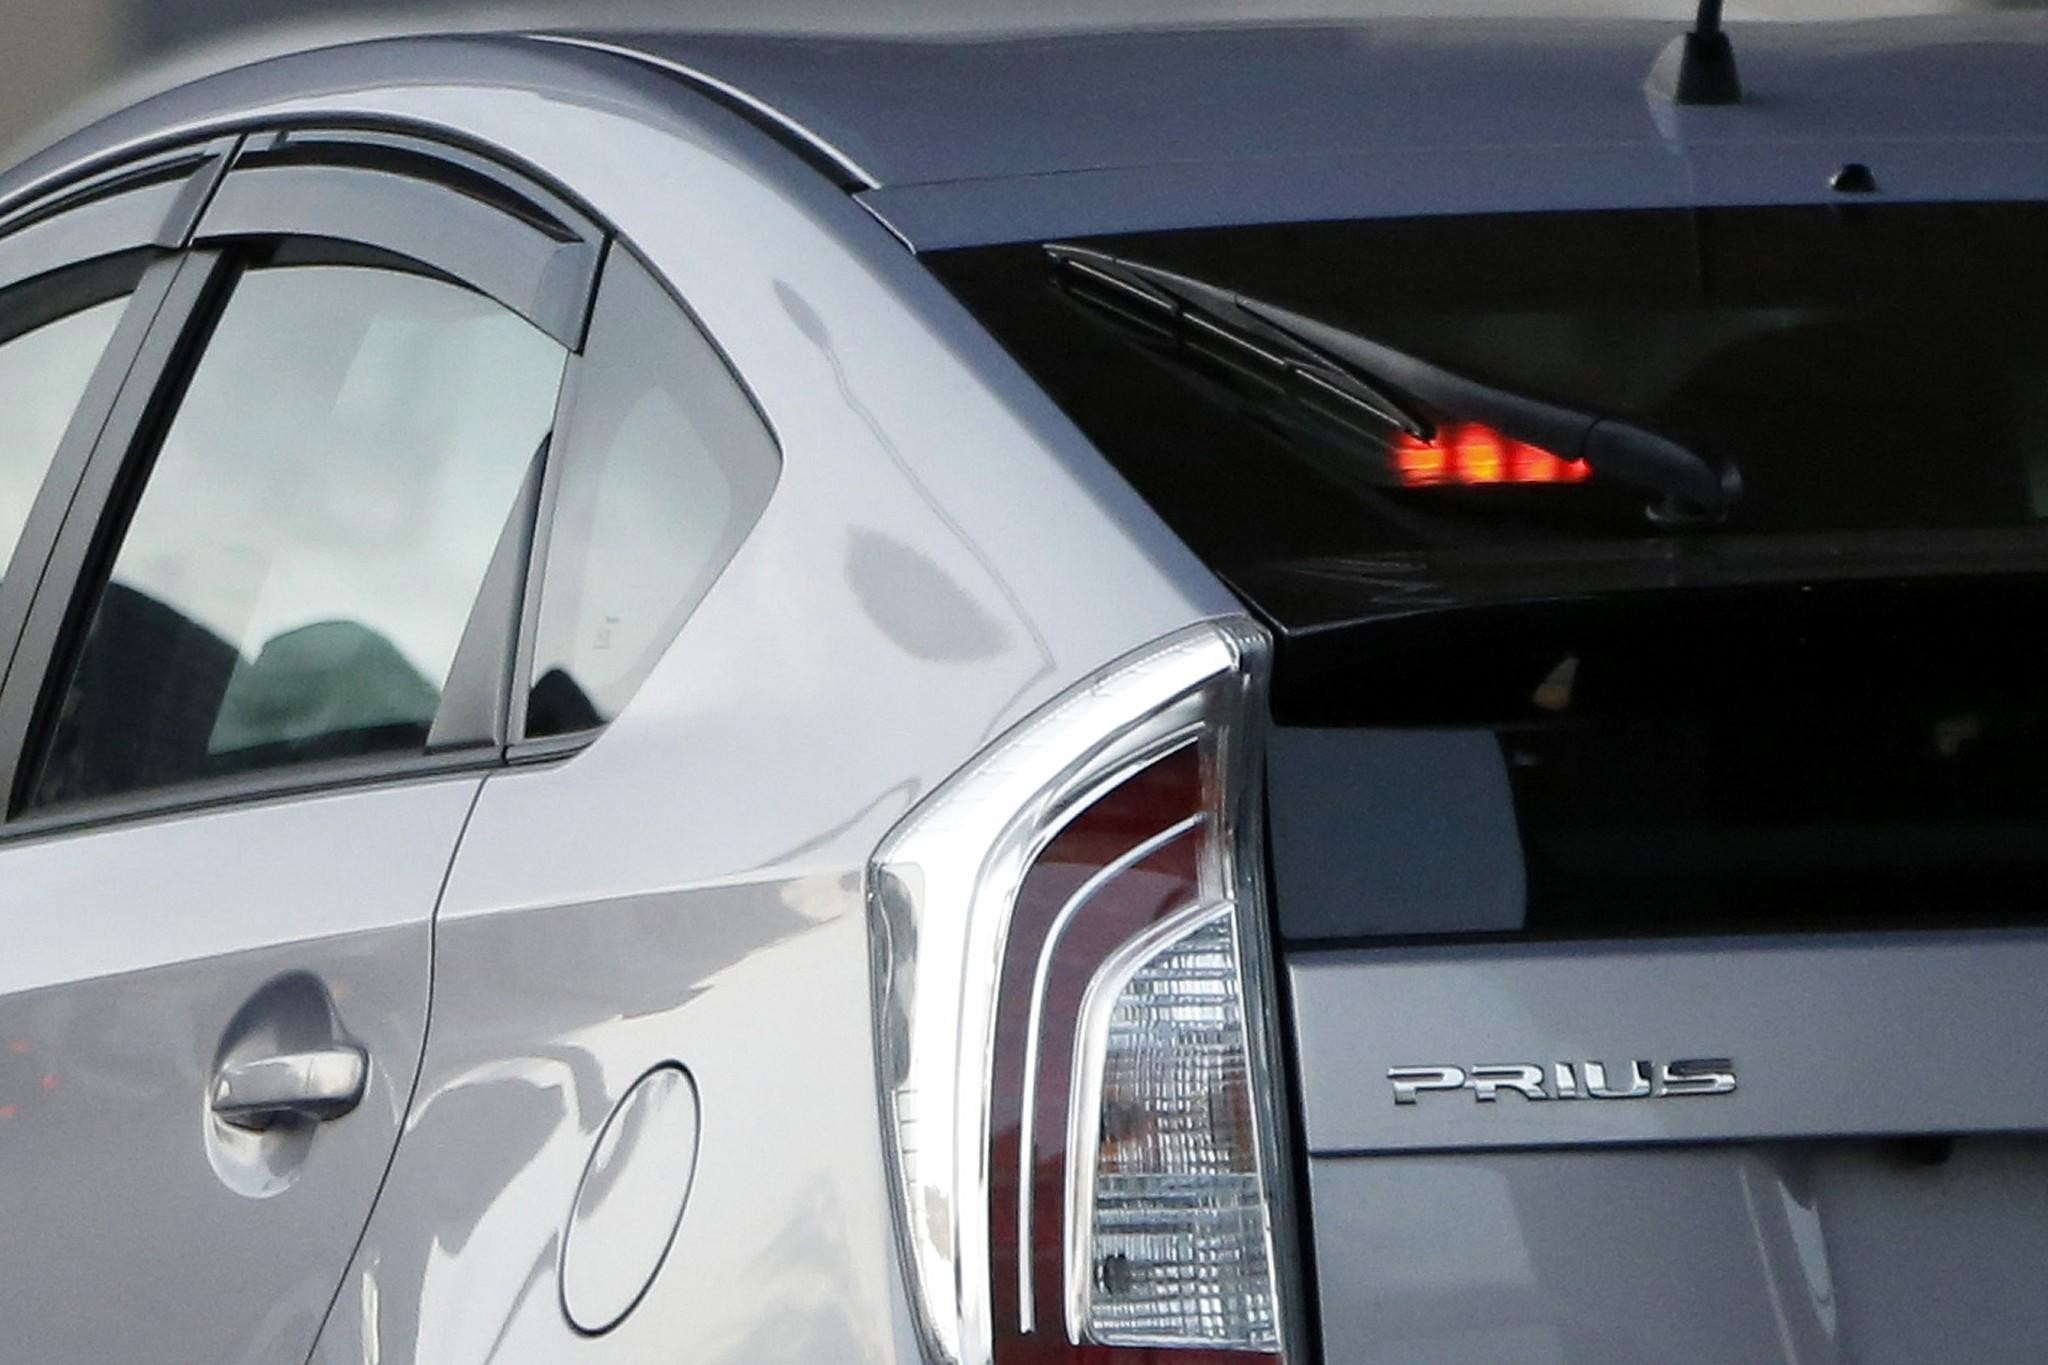 Toyota recalls 1 9 million Prius hybrids to fix software problem